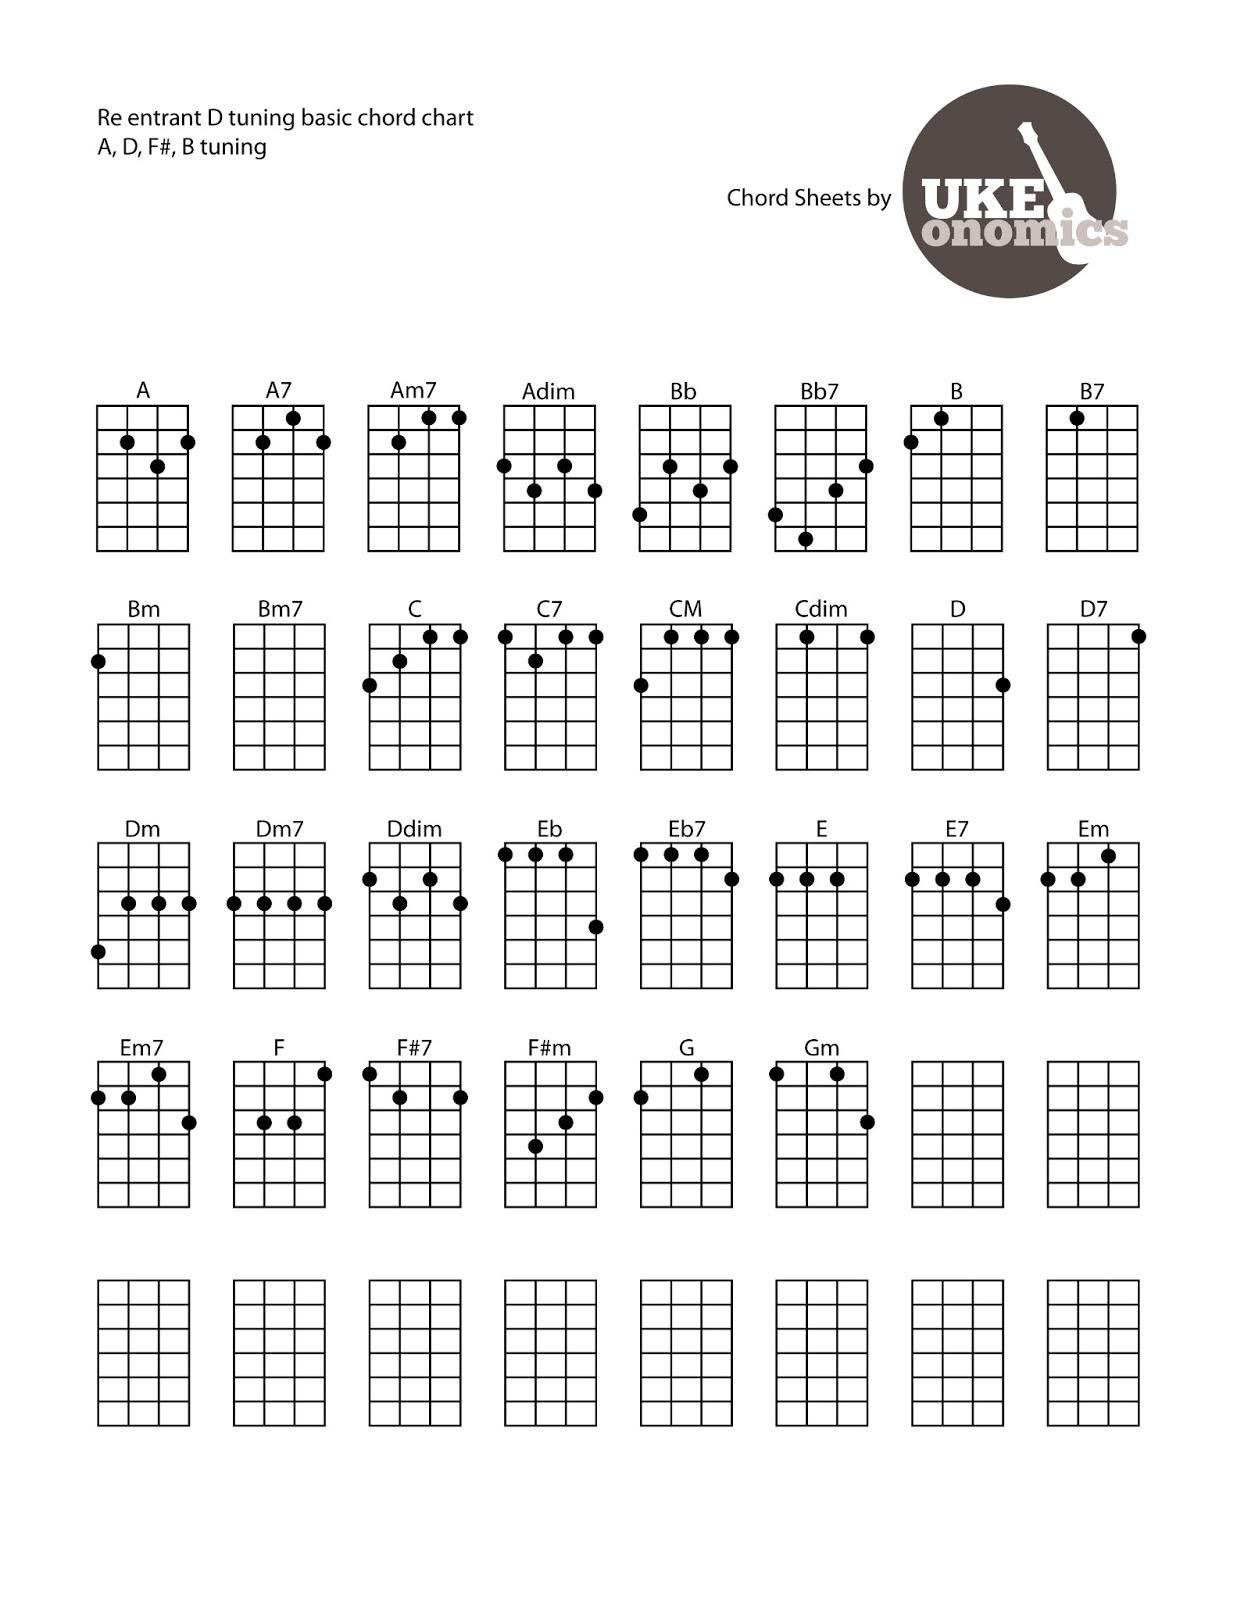 chord ukulele tuning chart chords uke re alternate tabs tunings sheet friend songs entrant ukelele tablature common basic open blank